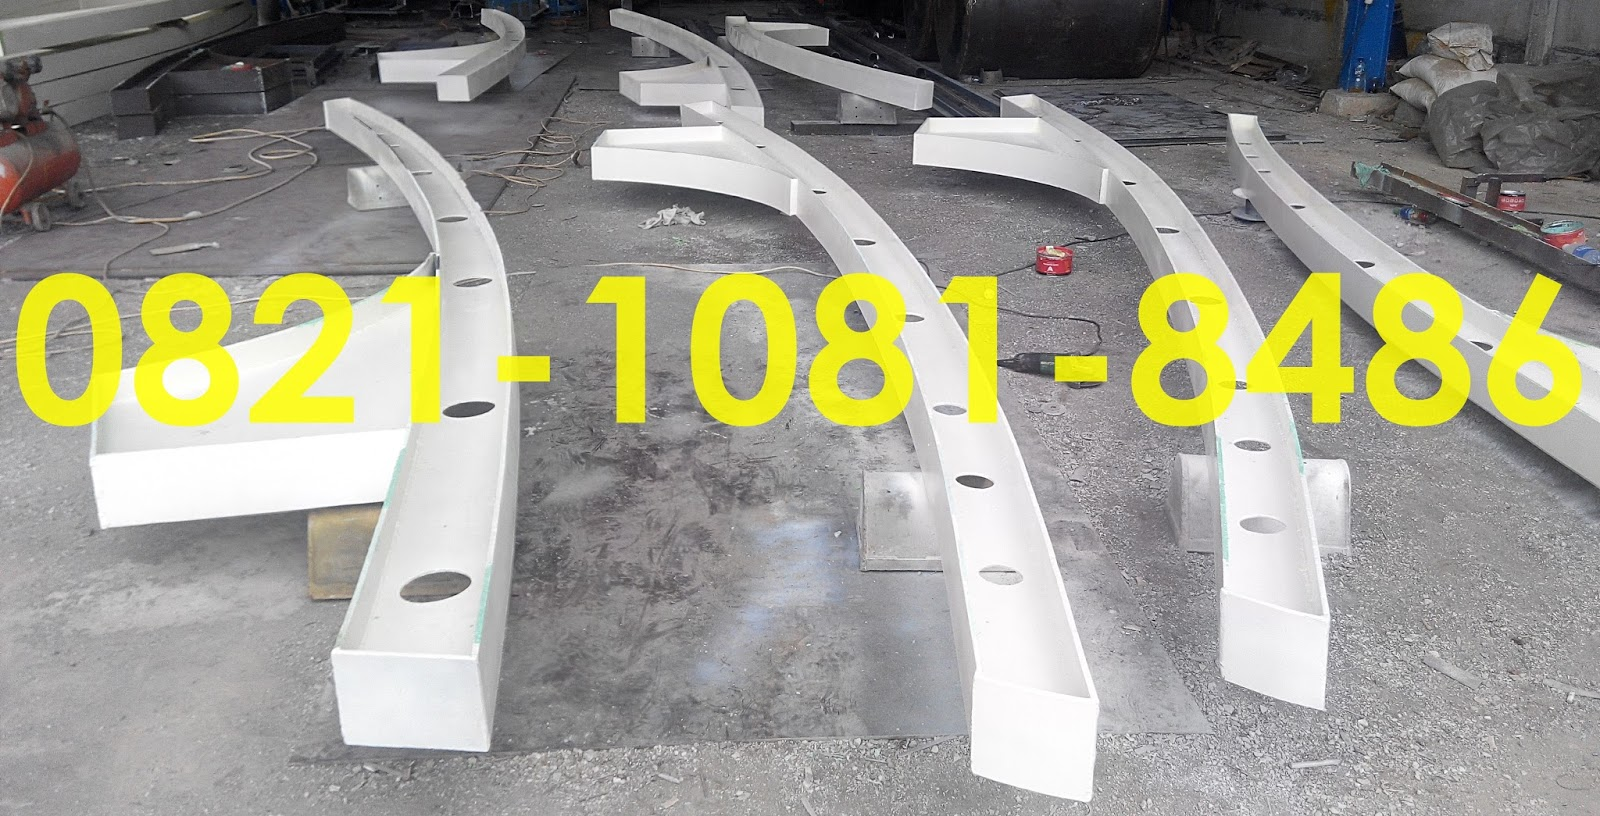 Jasa Fabrikasi Carport Kopi Bubuk Asli Pagar Alam By Butik 3 Size Plg Proses